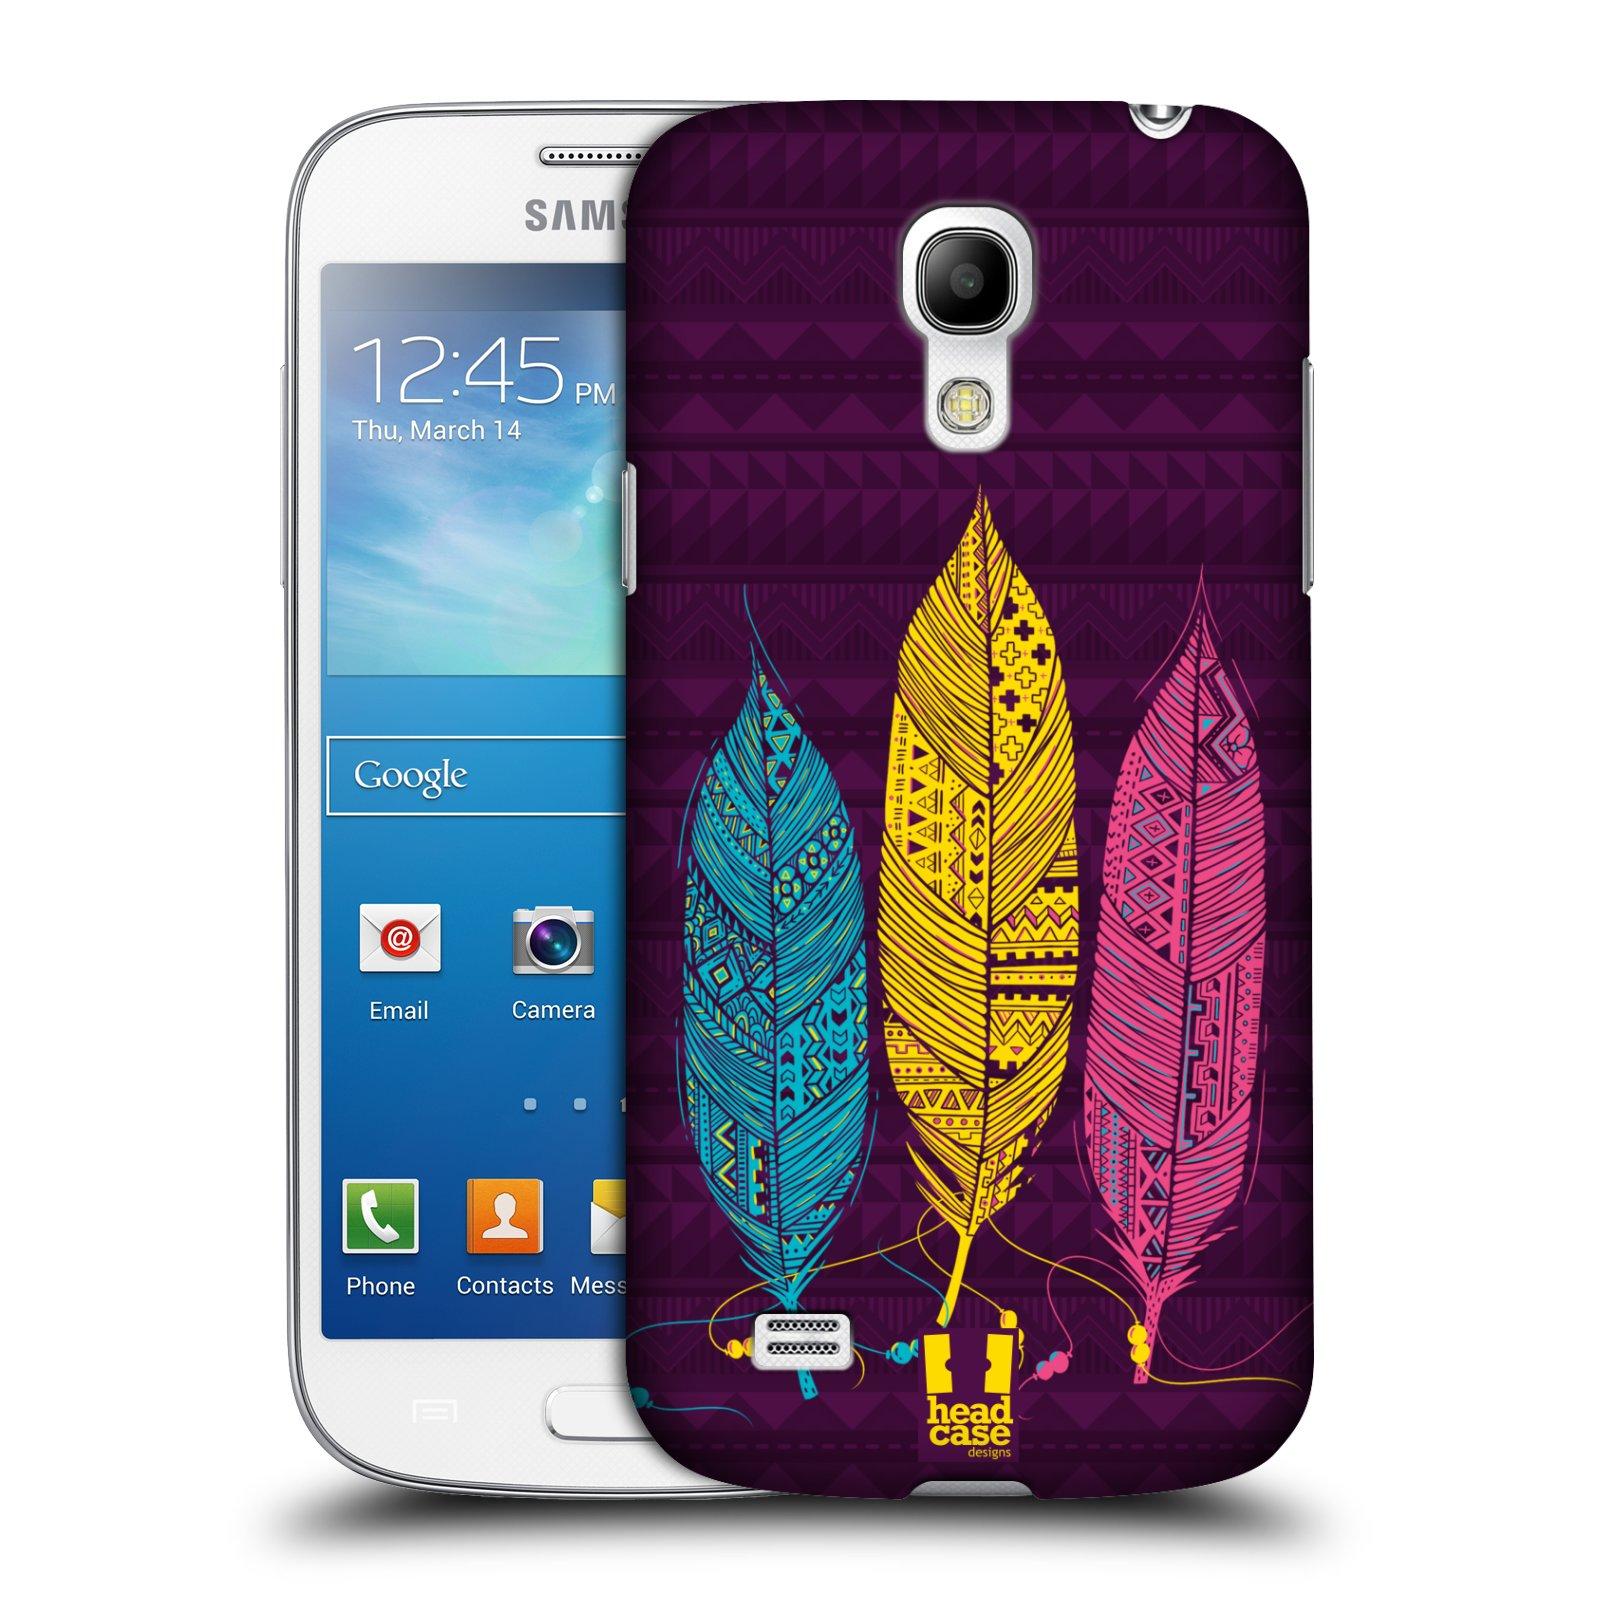 HEAD CASE plastový obal na mobil SAMSUNG Galaxy S4 MINI / S4 MINI VE (i9190, i9195i, i9195) vzor Aztécká pírka žlutá, modrá, růžová